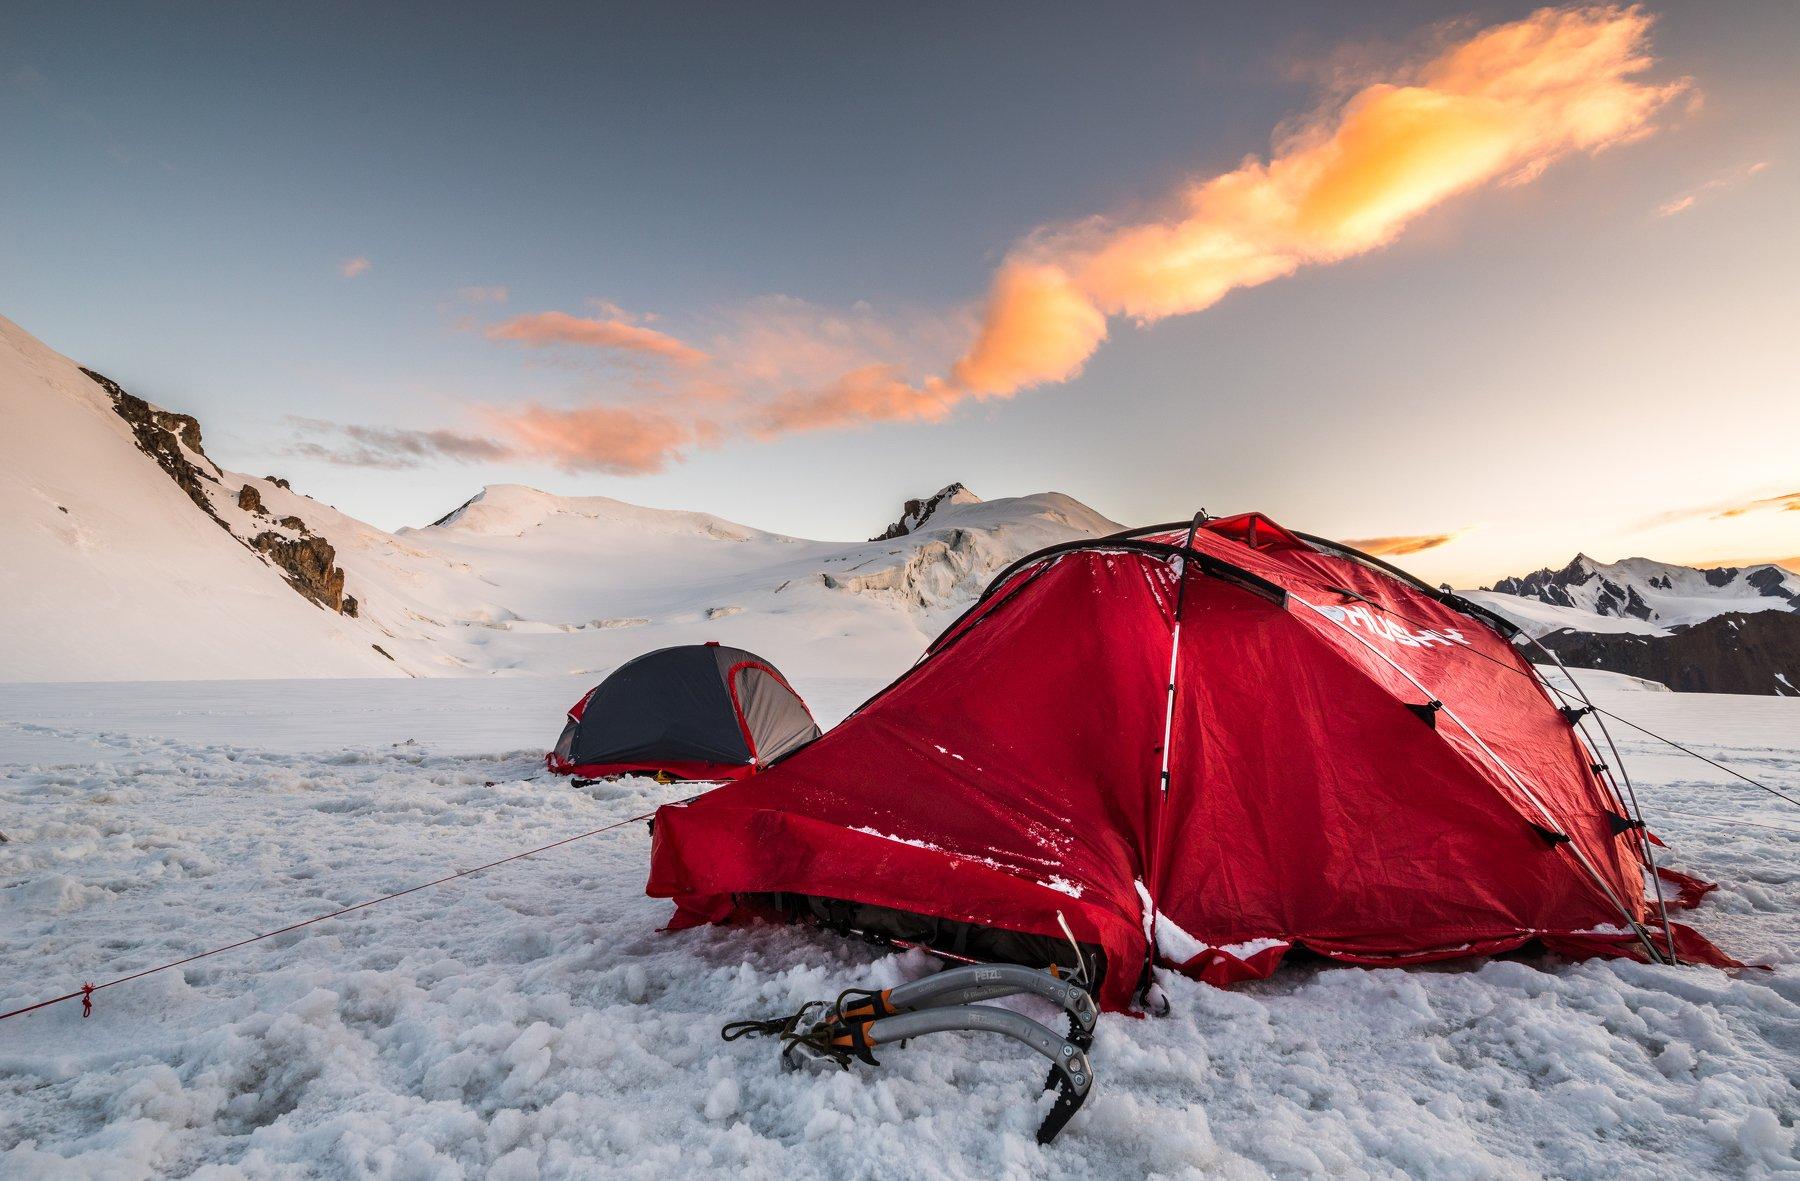 Куйлю, перевал, горы, палатка, ледник, Evgeniy Khilkevitch